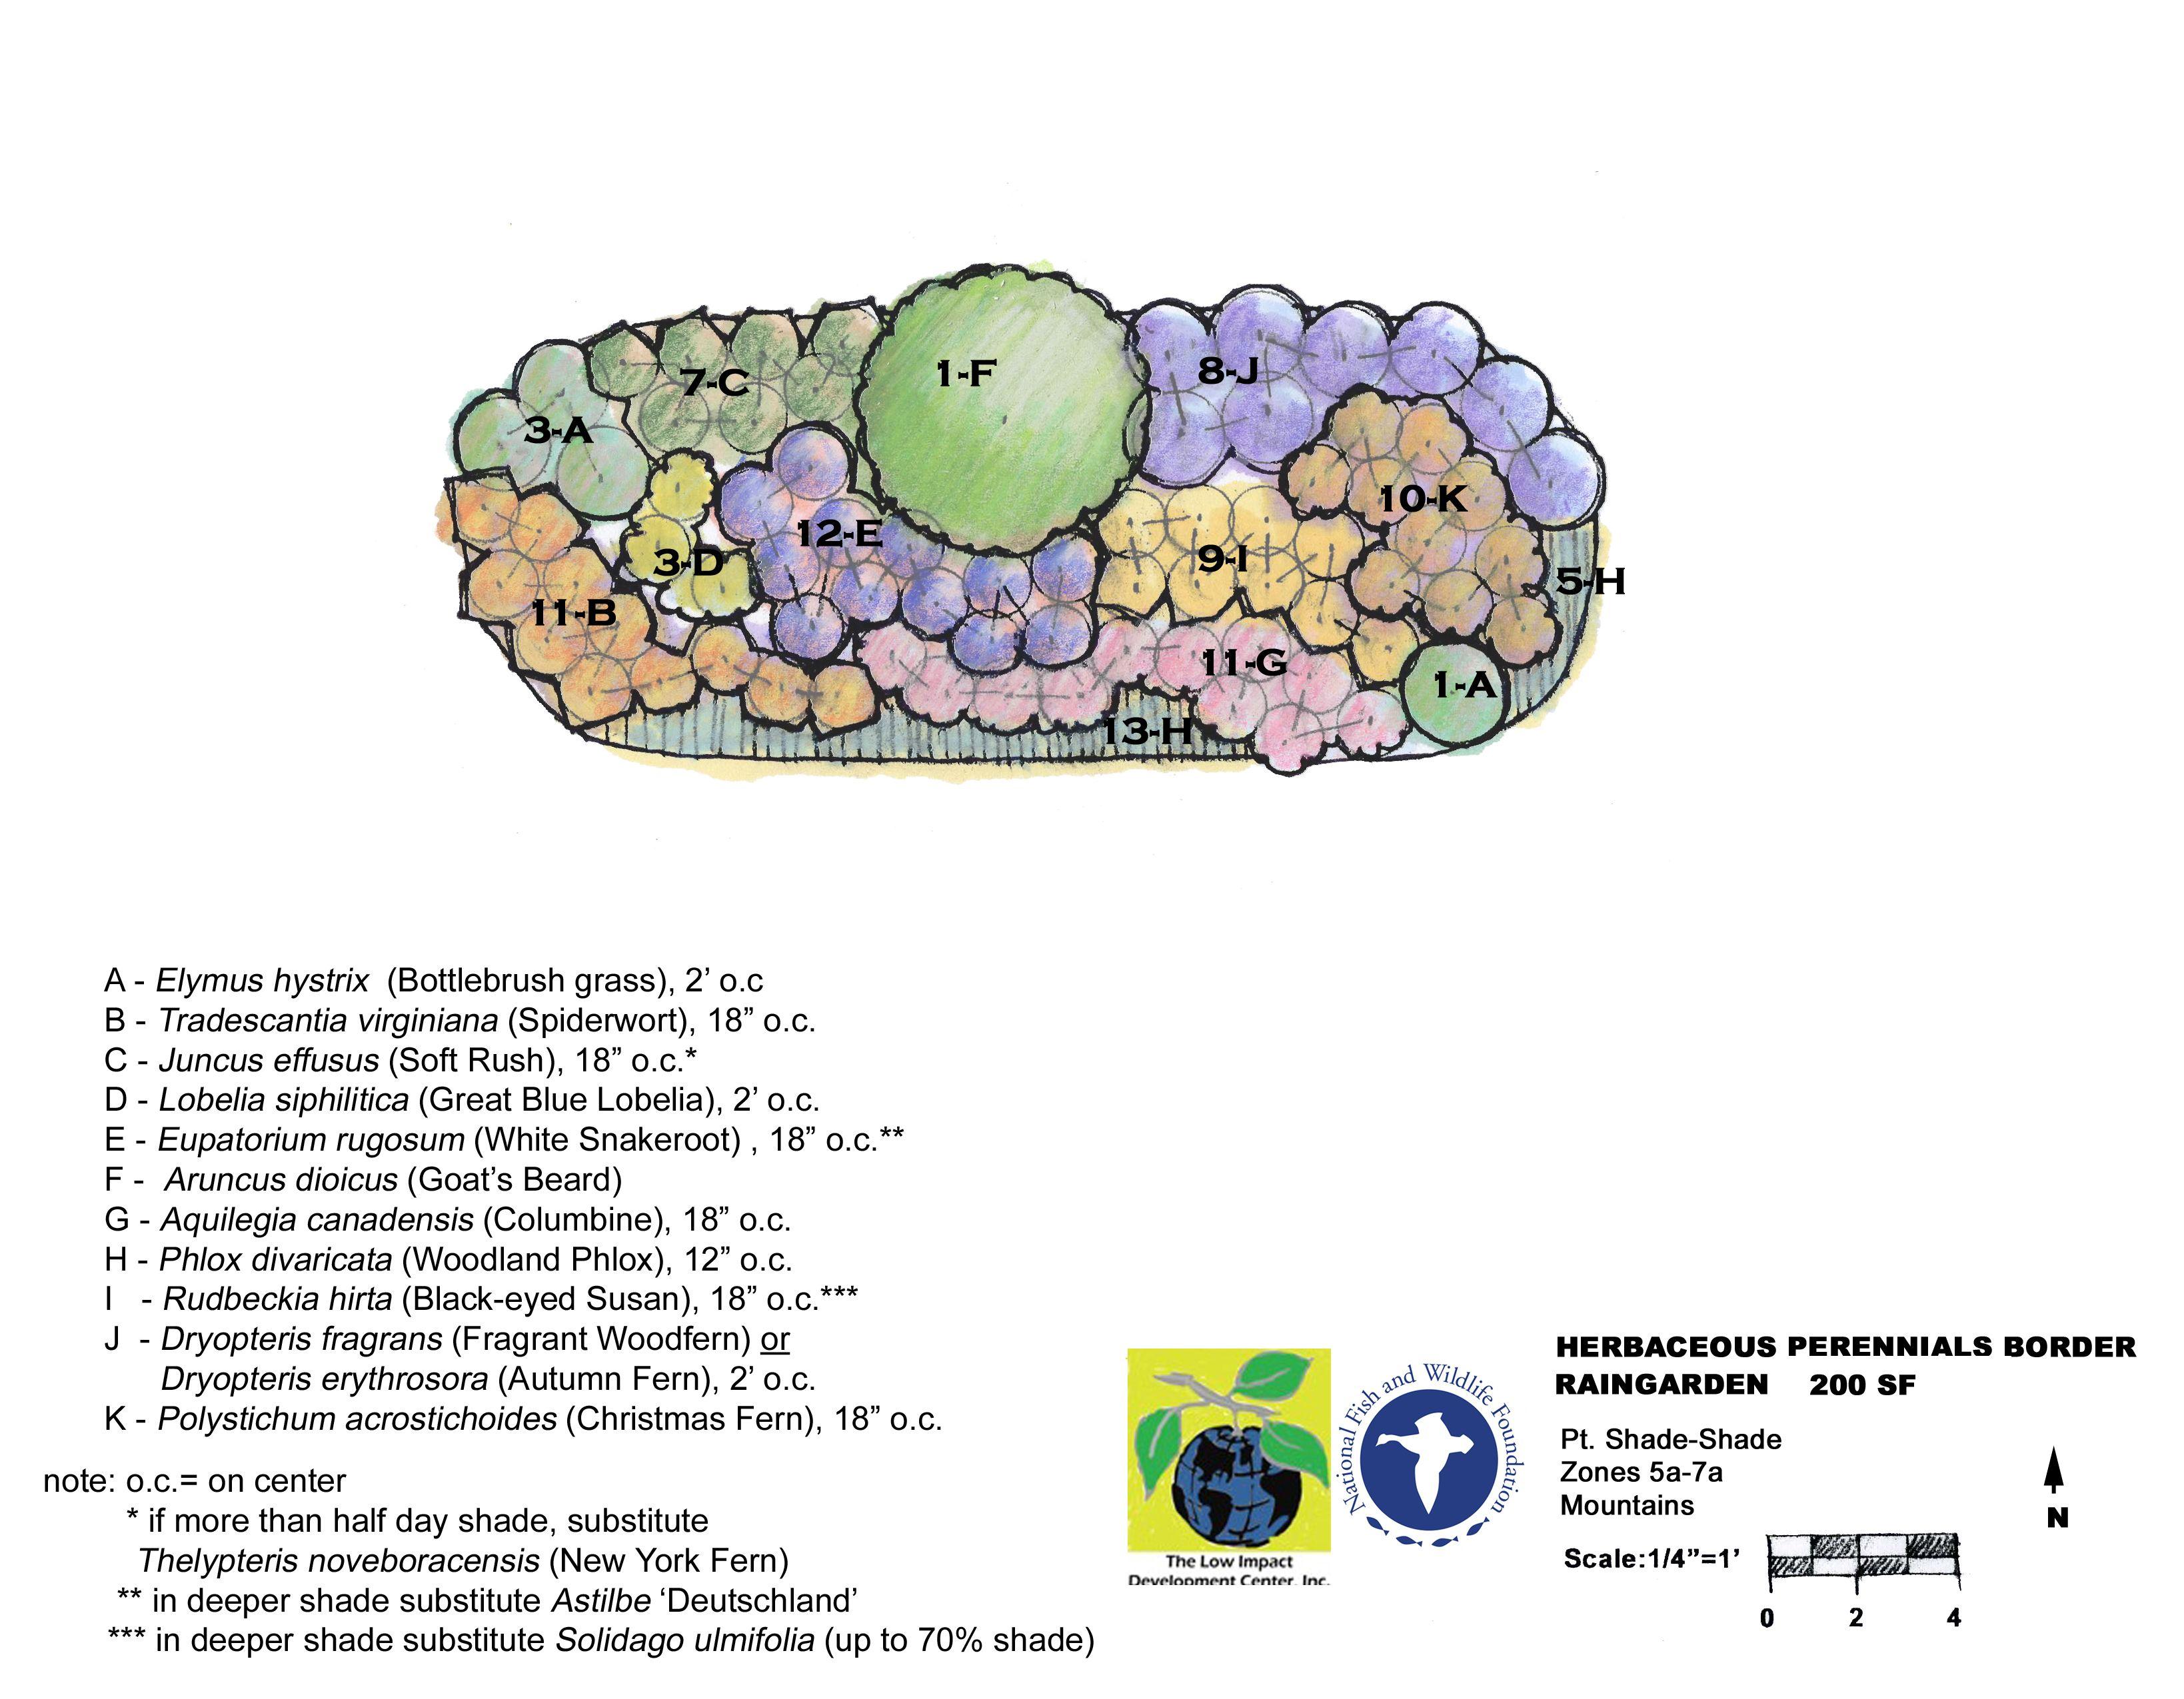 http://www.lowimpactdevelopment.org/raingarden_design/Templates4RainGardens/Templates4ShadeMountain/HerbacPerenn200SFQScaleMtnShade.jpg